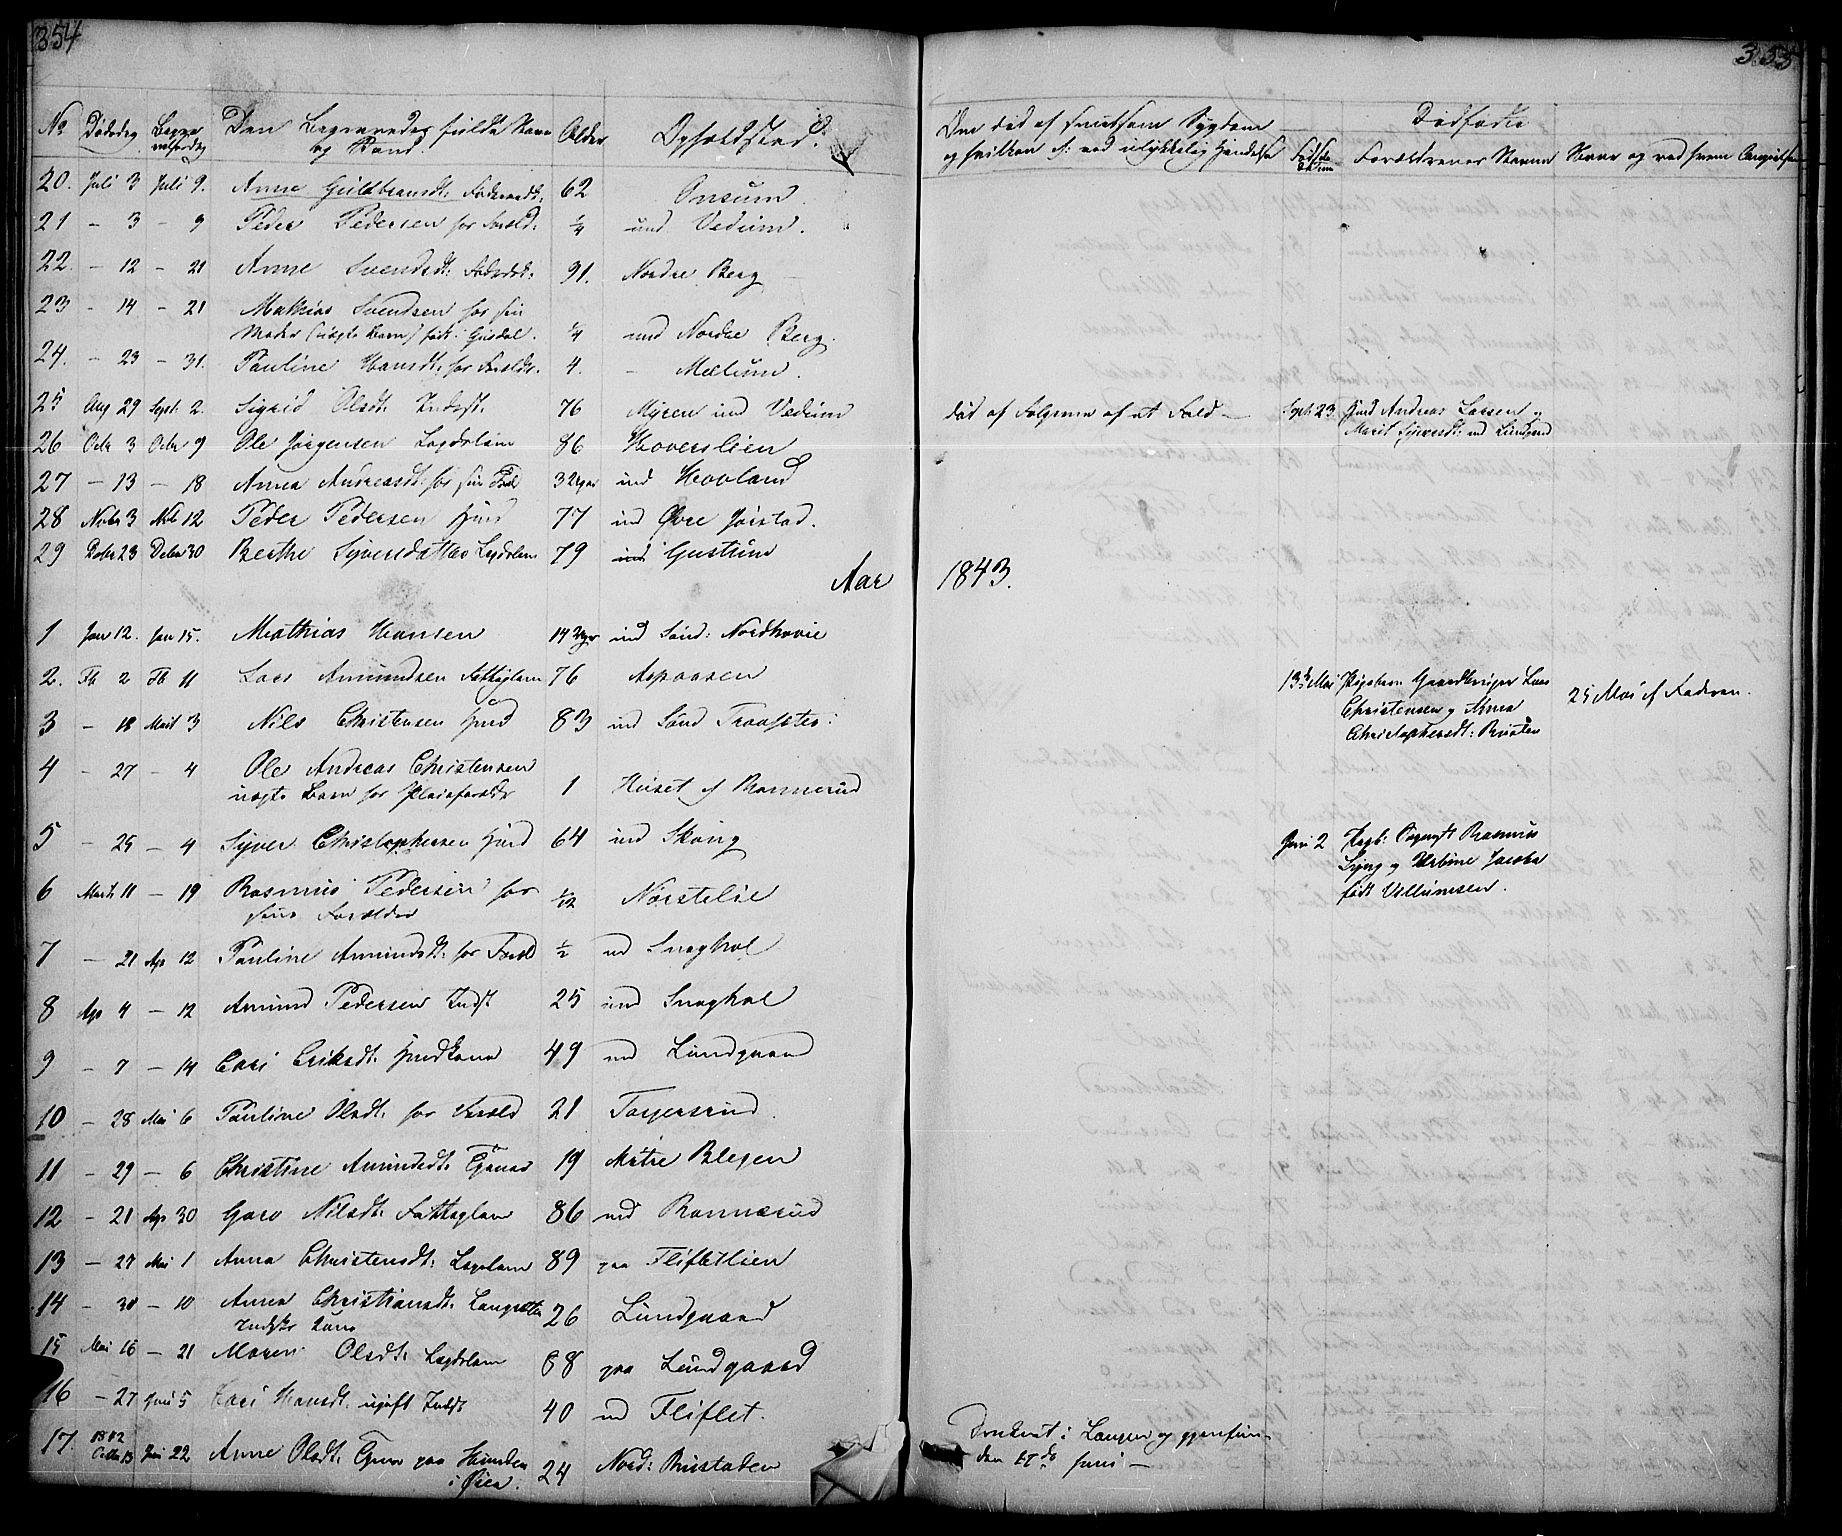 SAH, Fåberg prestekontor, Klokkerbok nr. 5, 1837-1864, s. 354-355